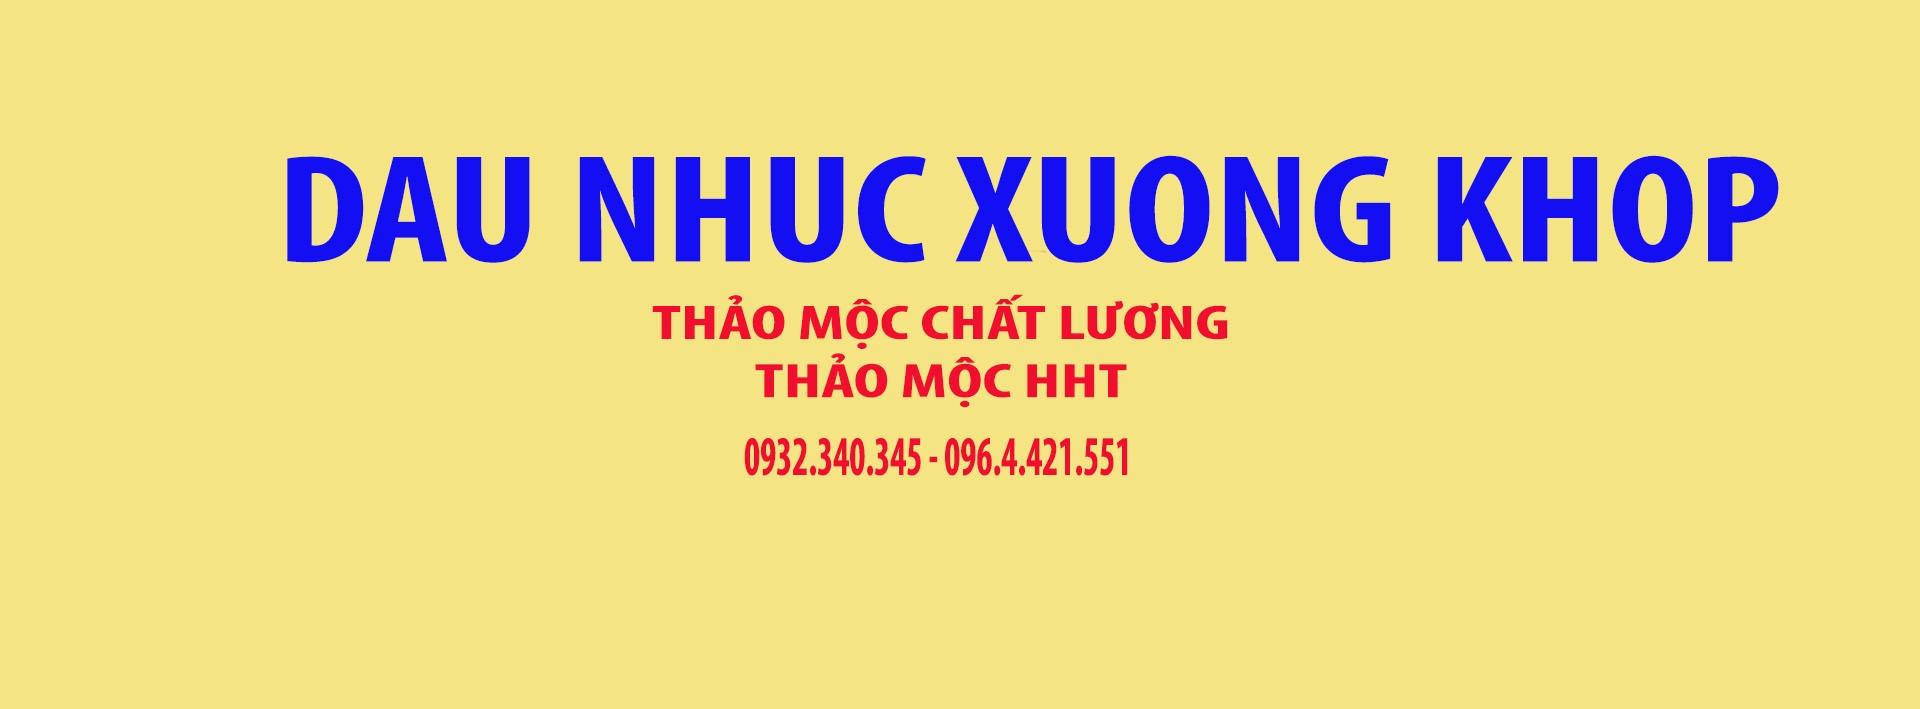 Dau nhuc xuong khop (@daunhuchht) Cover Image